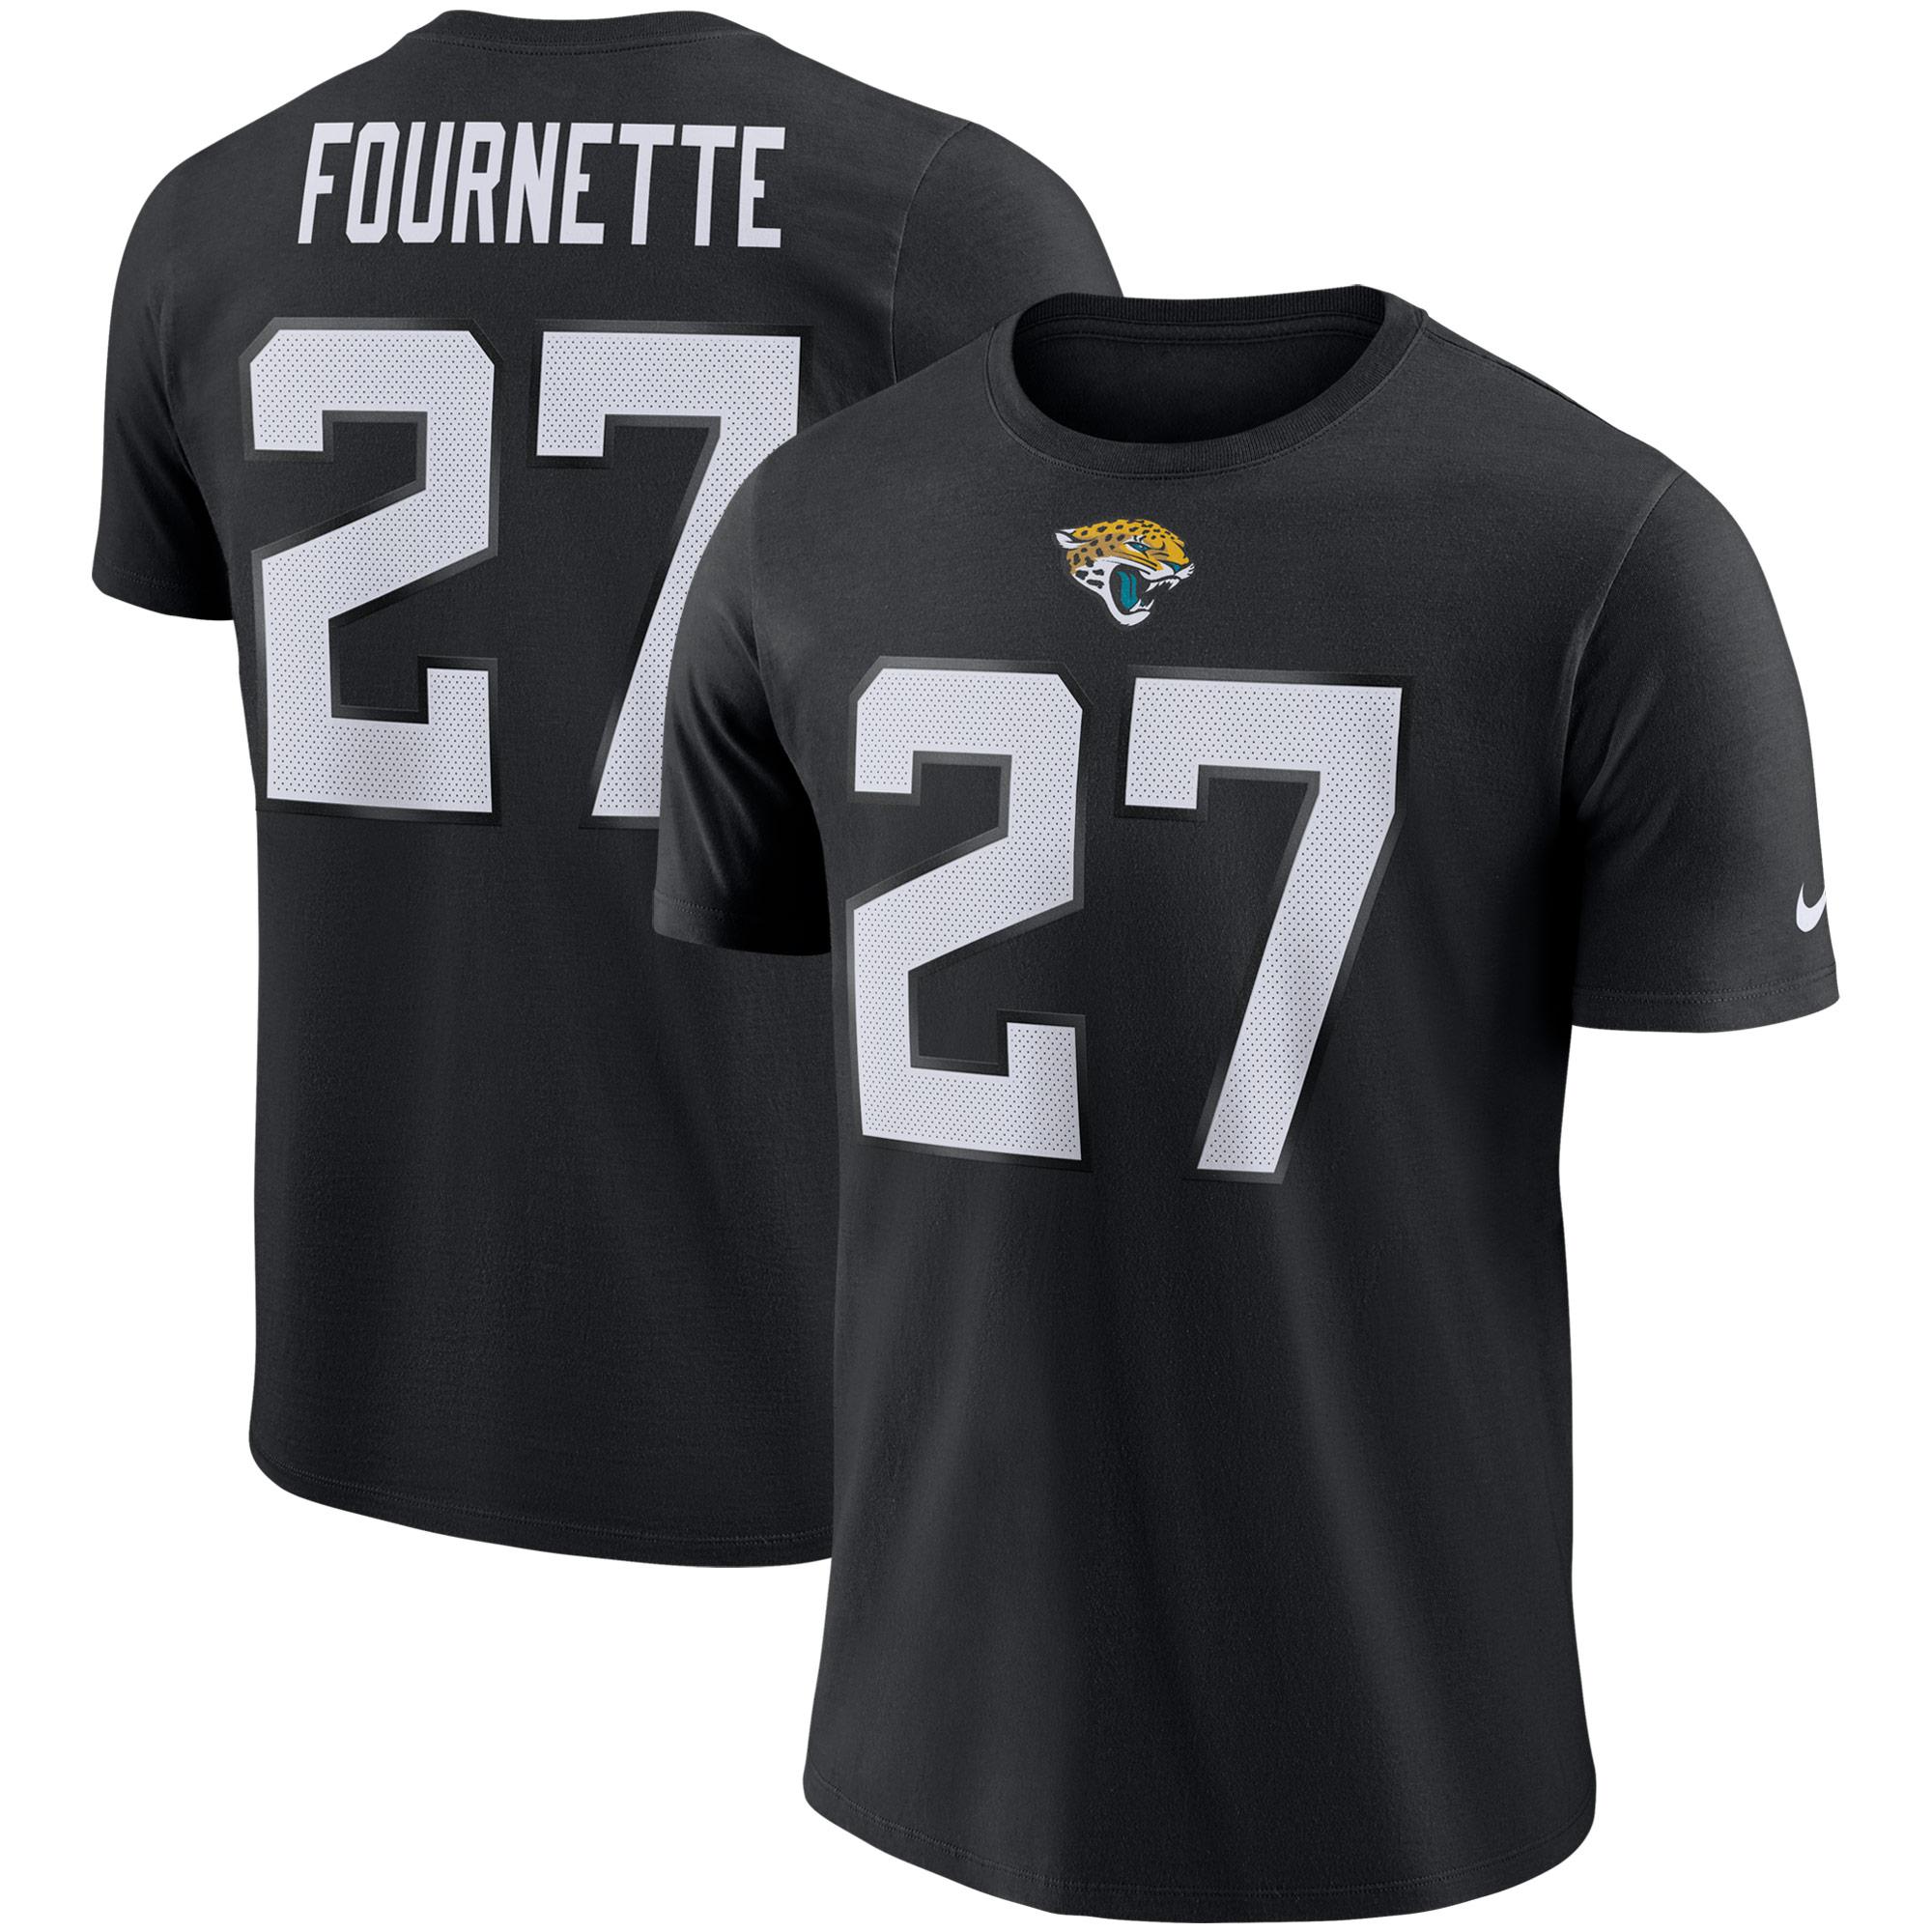 Leonard Fournette Jacksonville Jaguars Nike Player Pride Name & Number Performance T-Shirt - Black